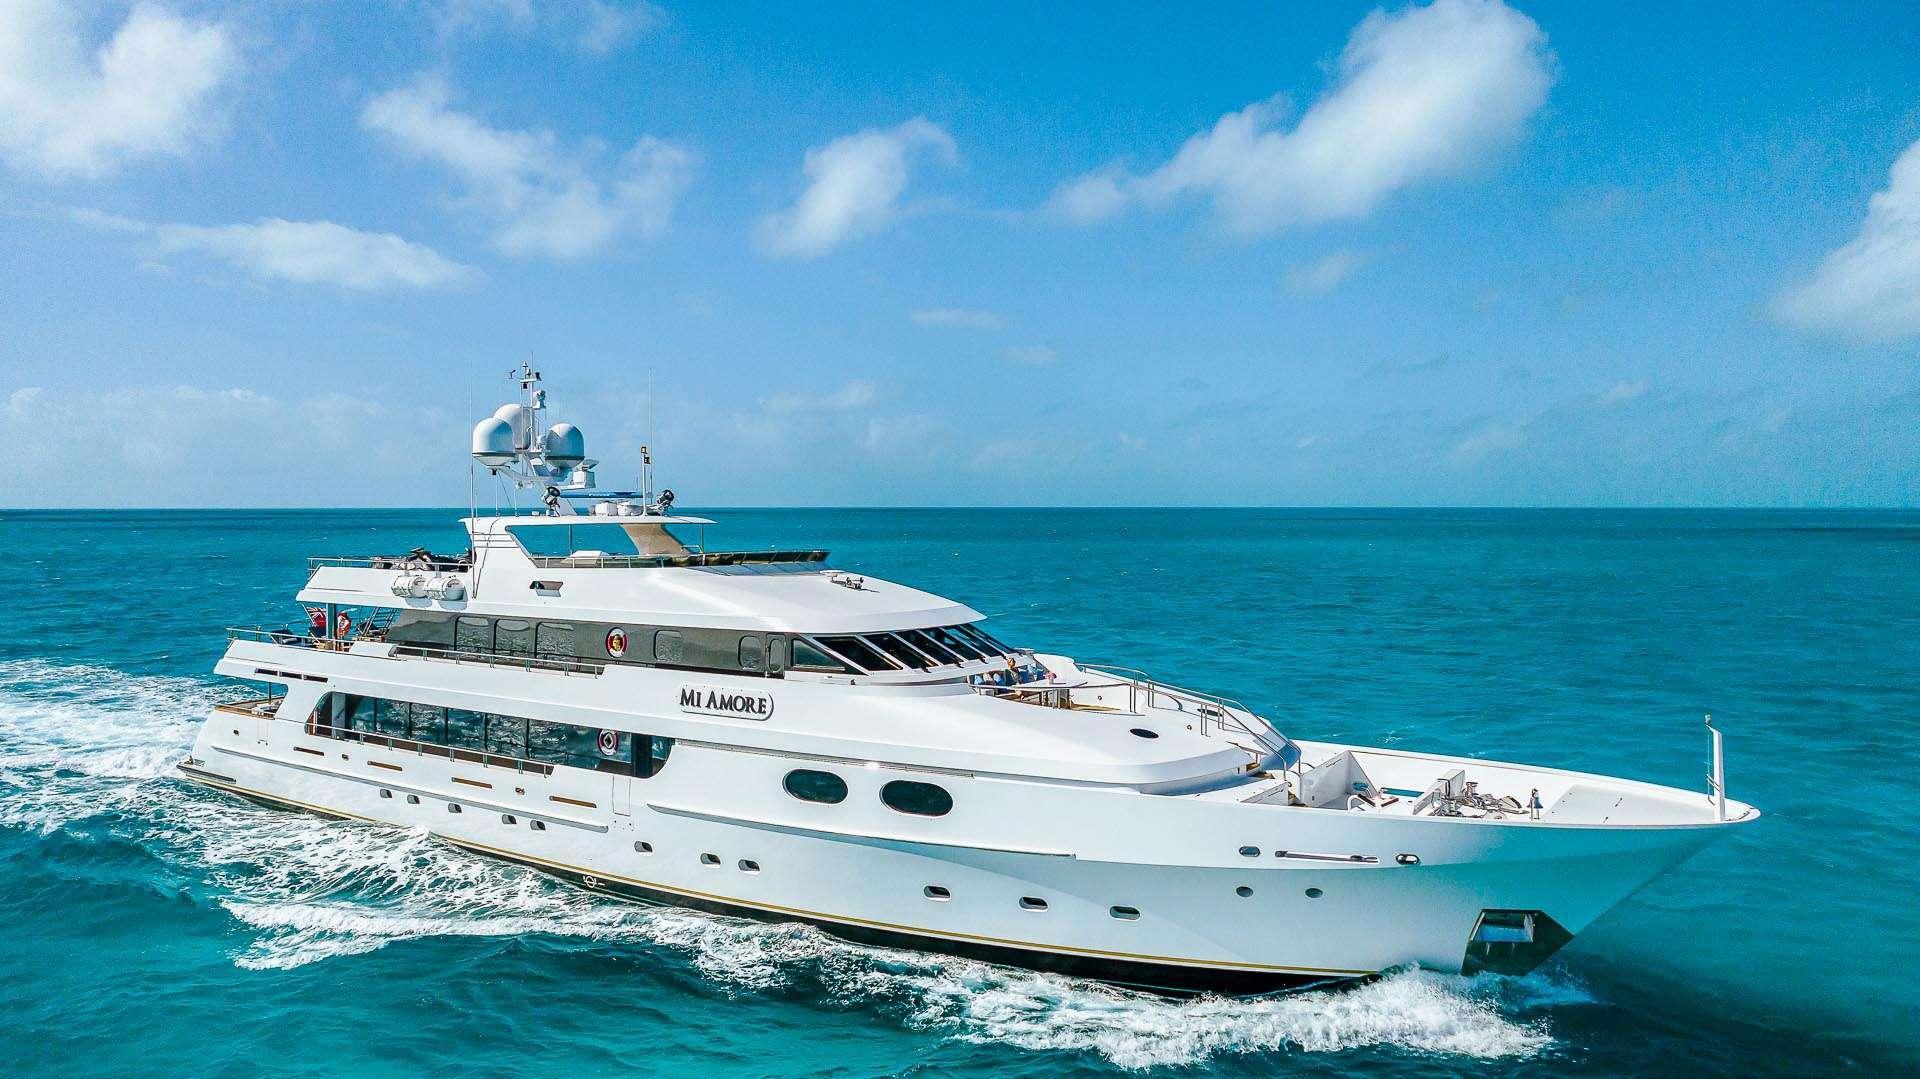 Luxury Yacht MI AMORE